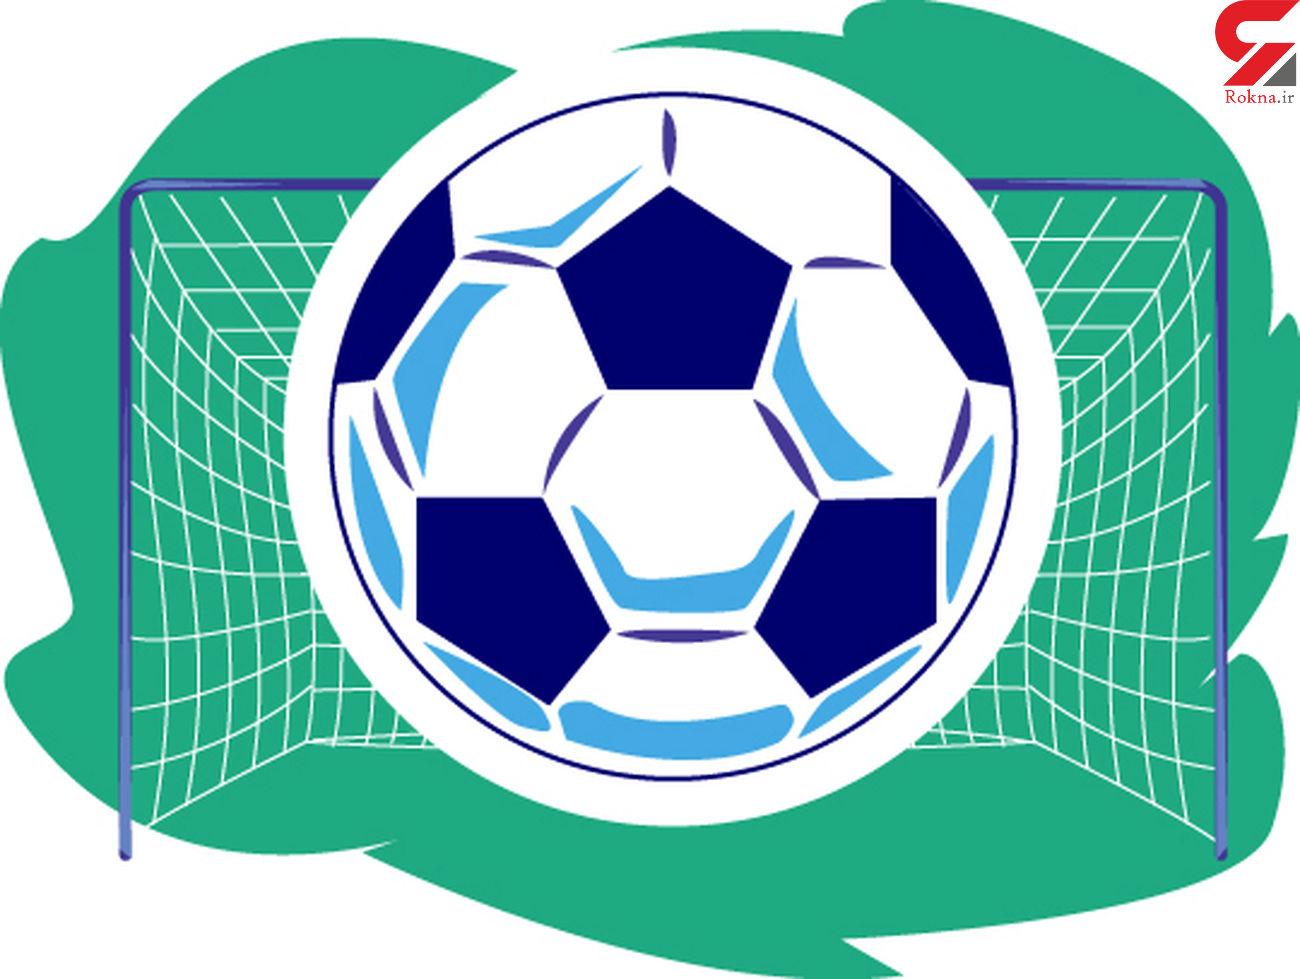 آغاز جام حذفی فوتبال سمنان